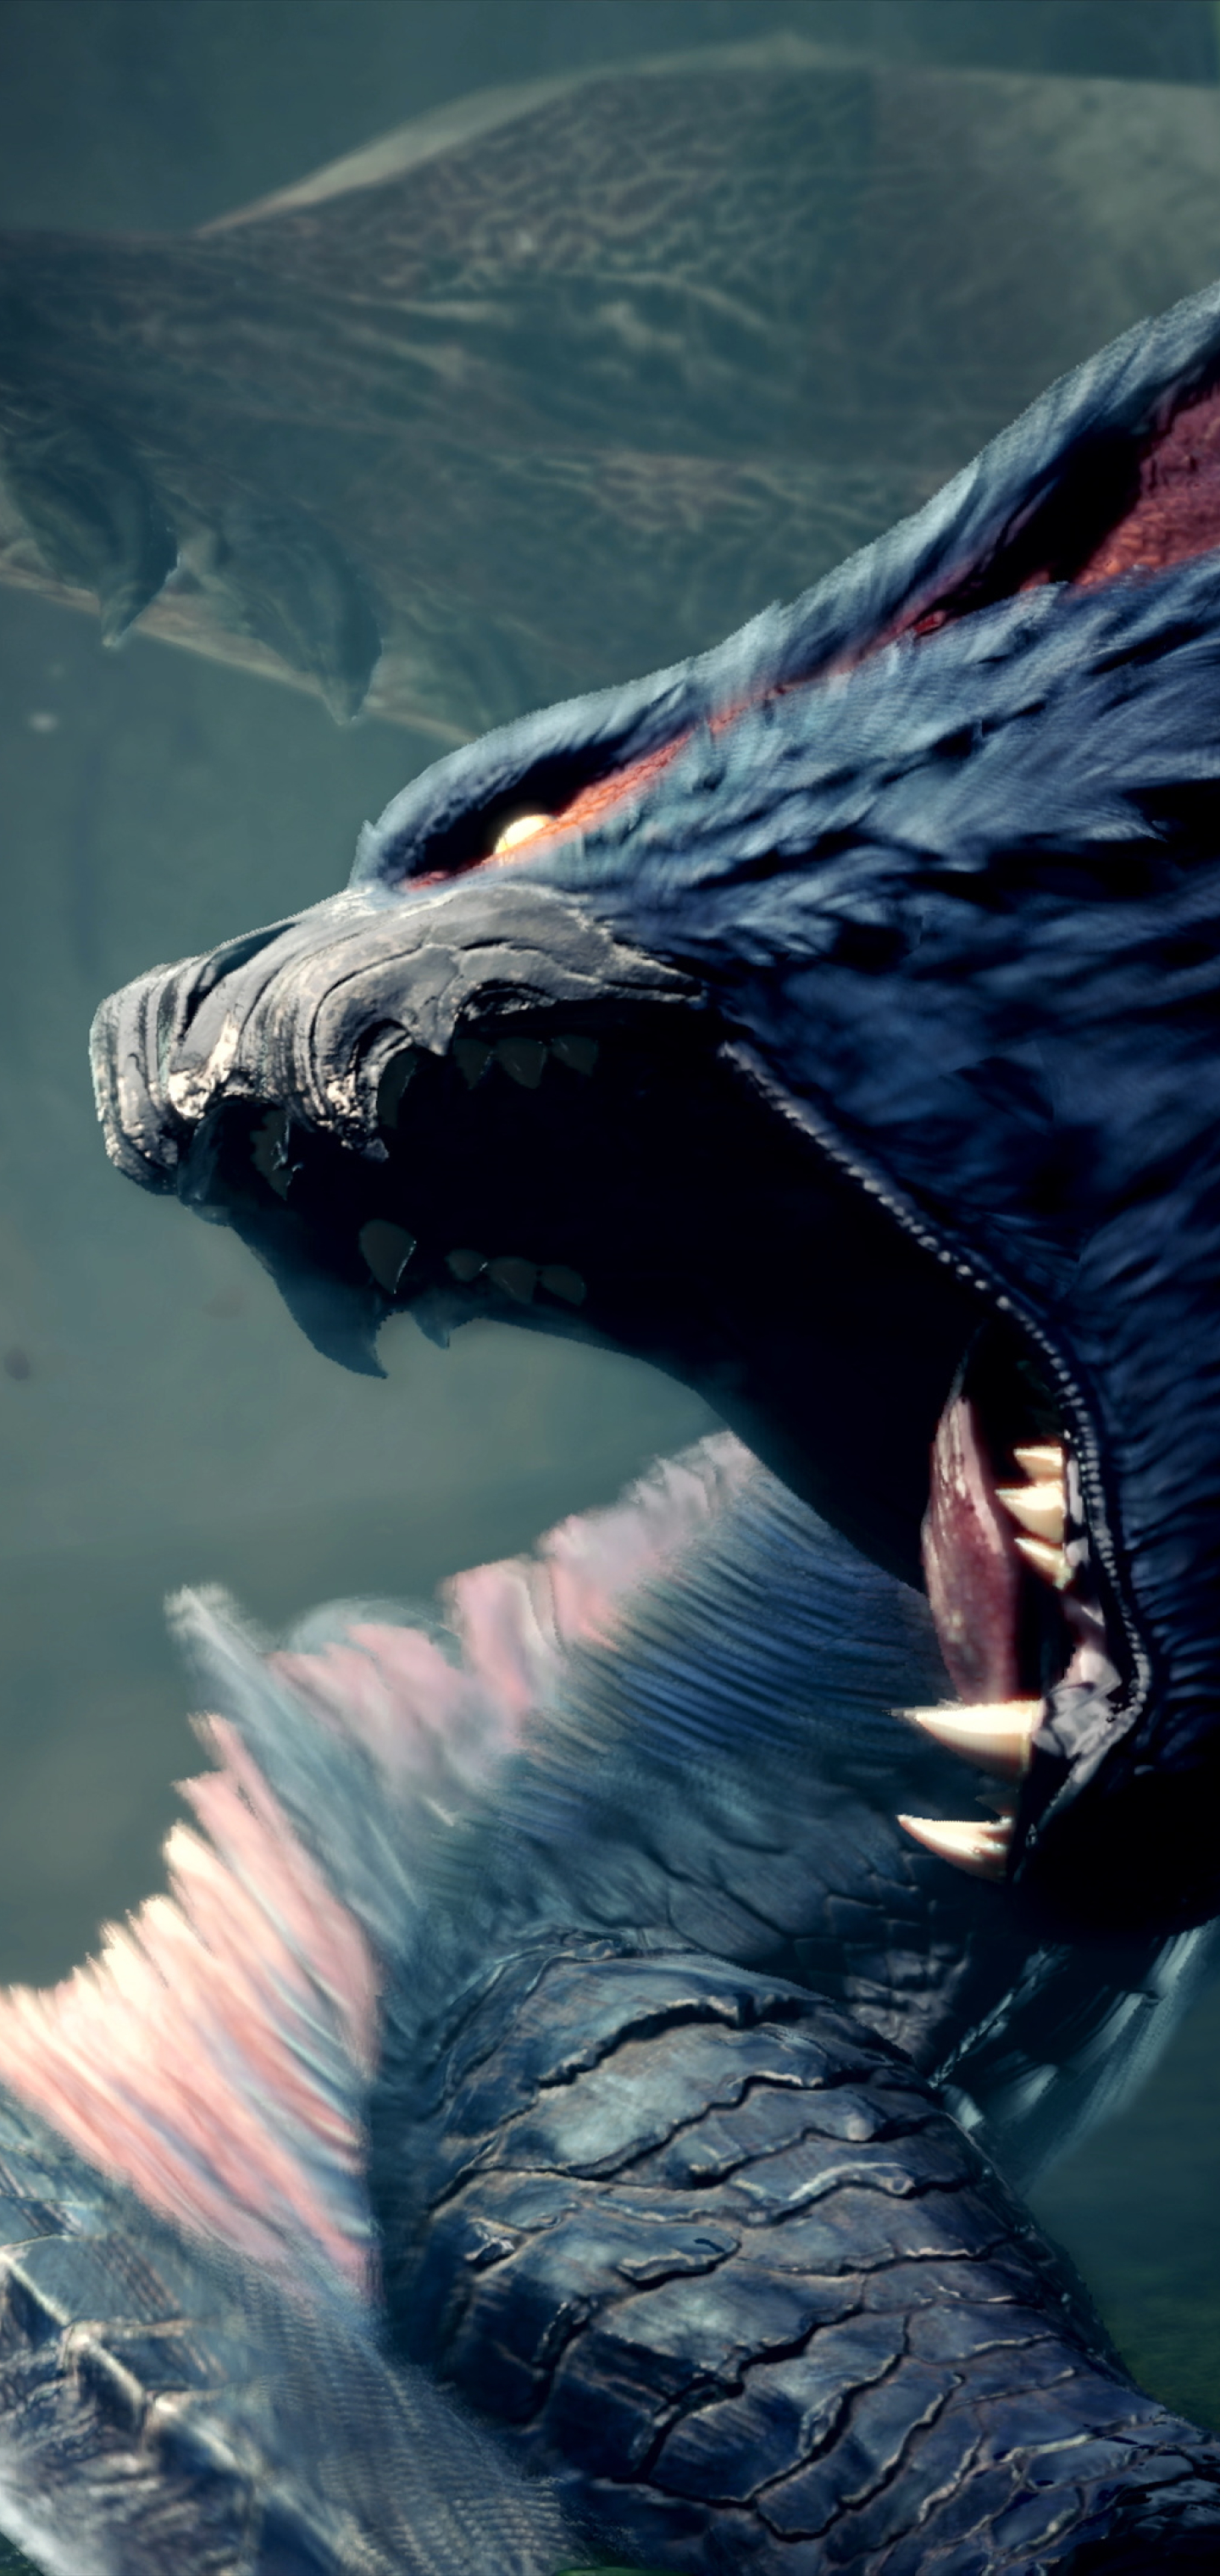 monster hunter world wallpaper hd